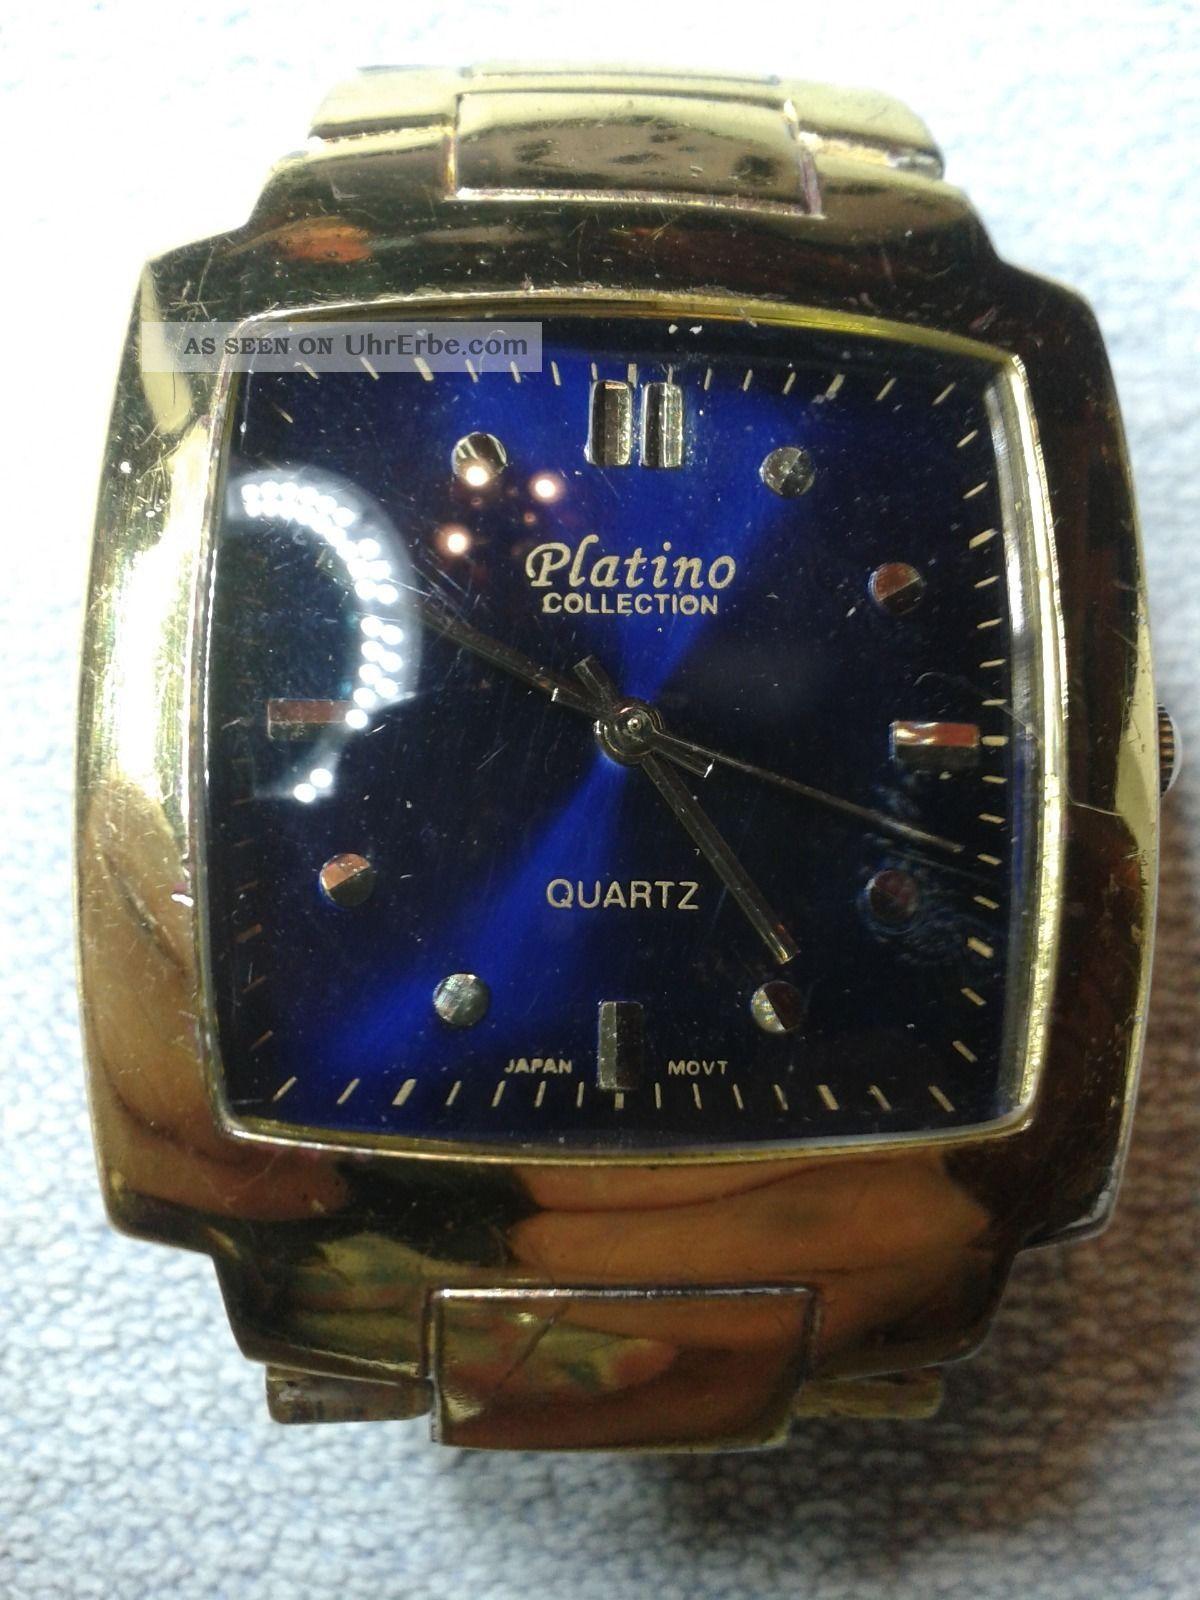 Platino Uhr